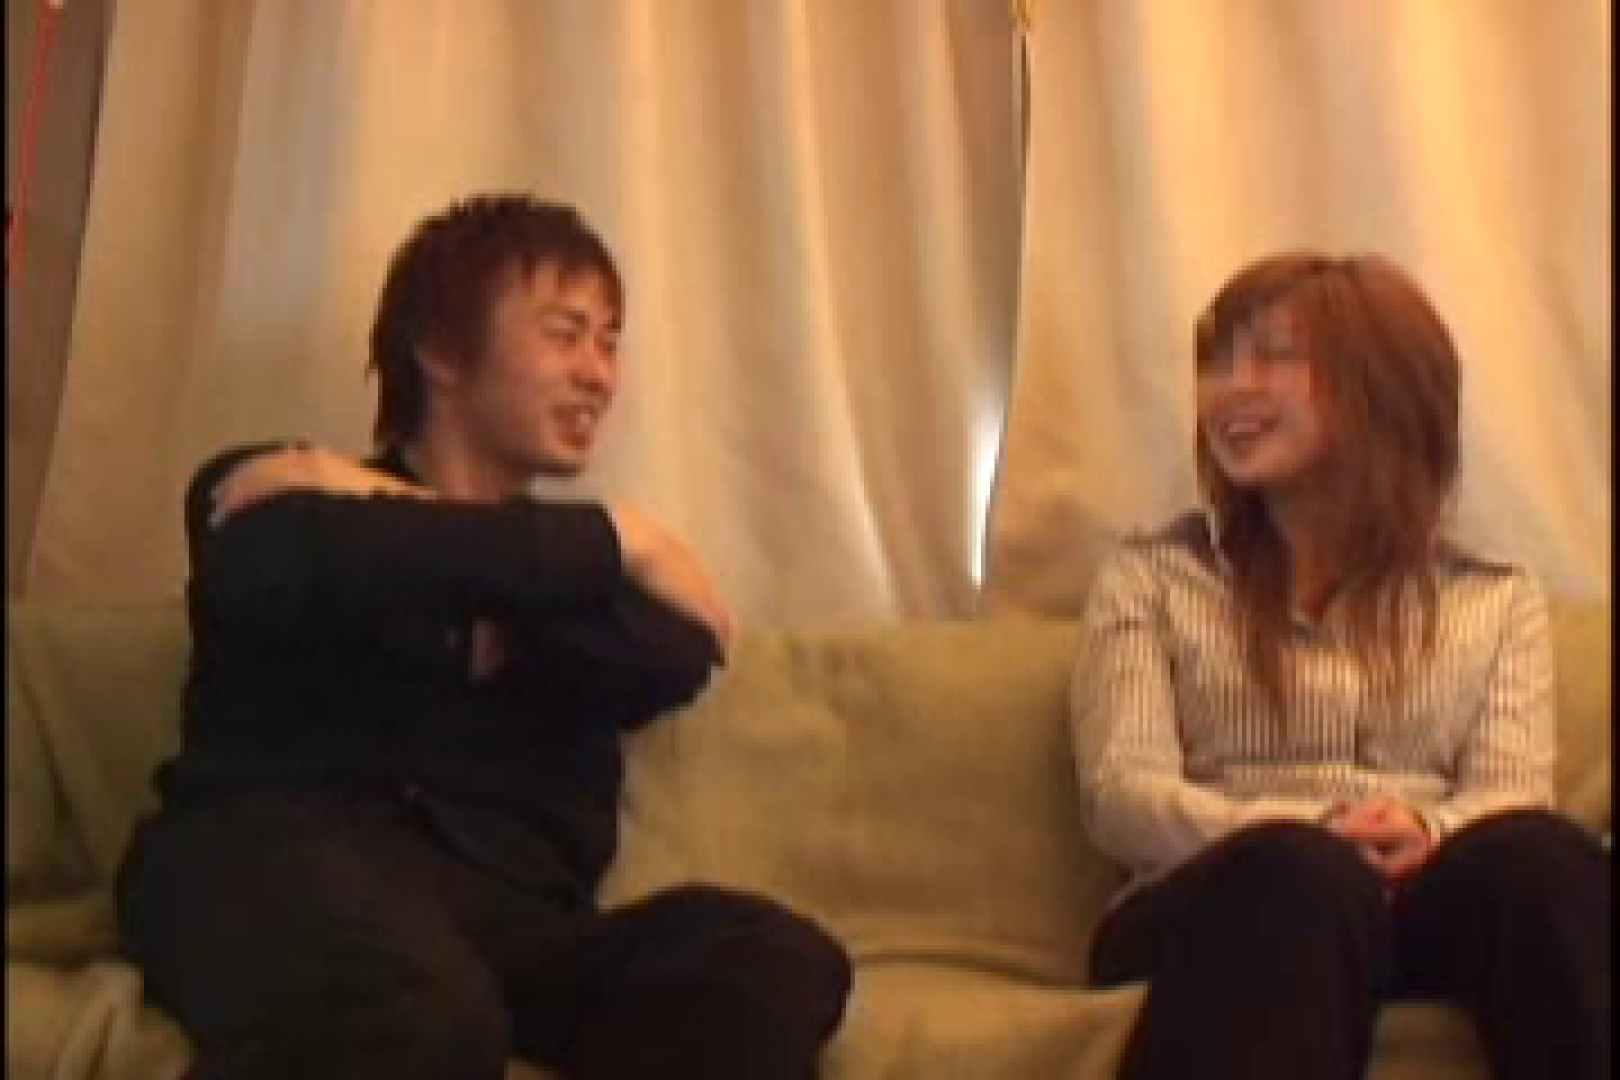 BEST OF イケメン!!男目線のガチSEX vol.03(対女性作品) オナニー ゲイフリーエロ画像 55pic 3